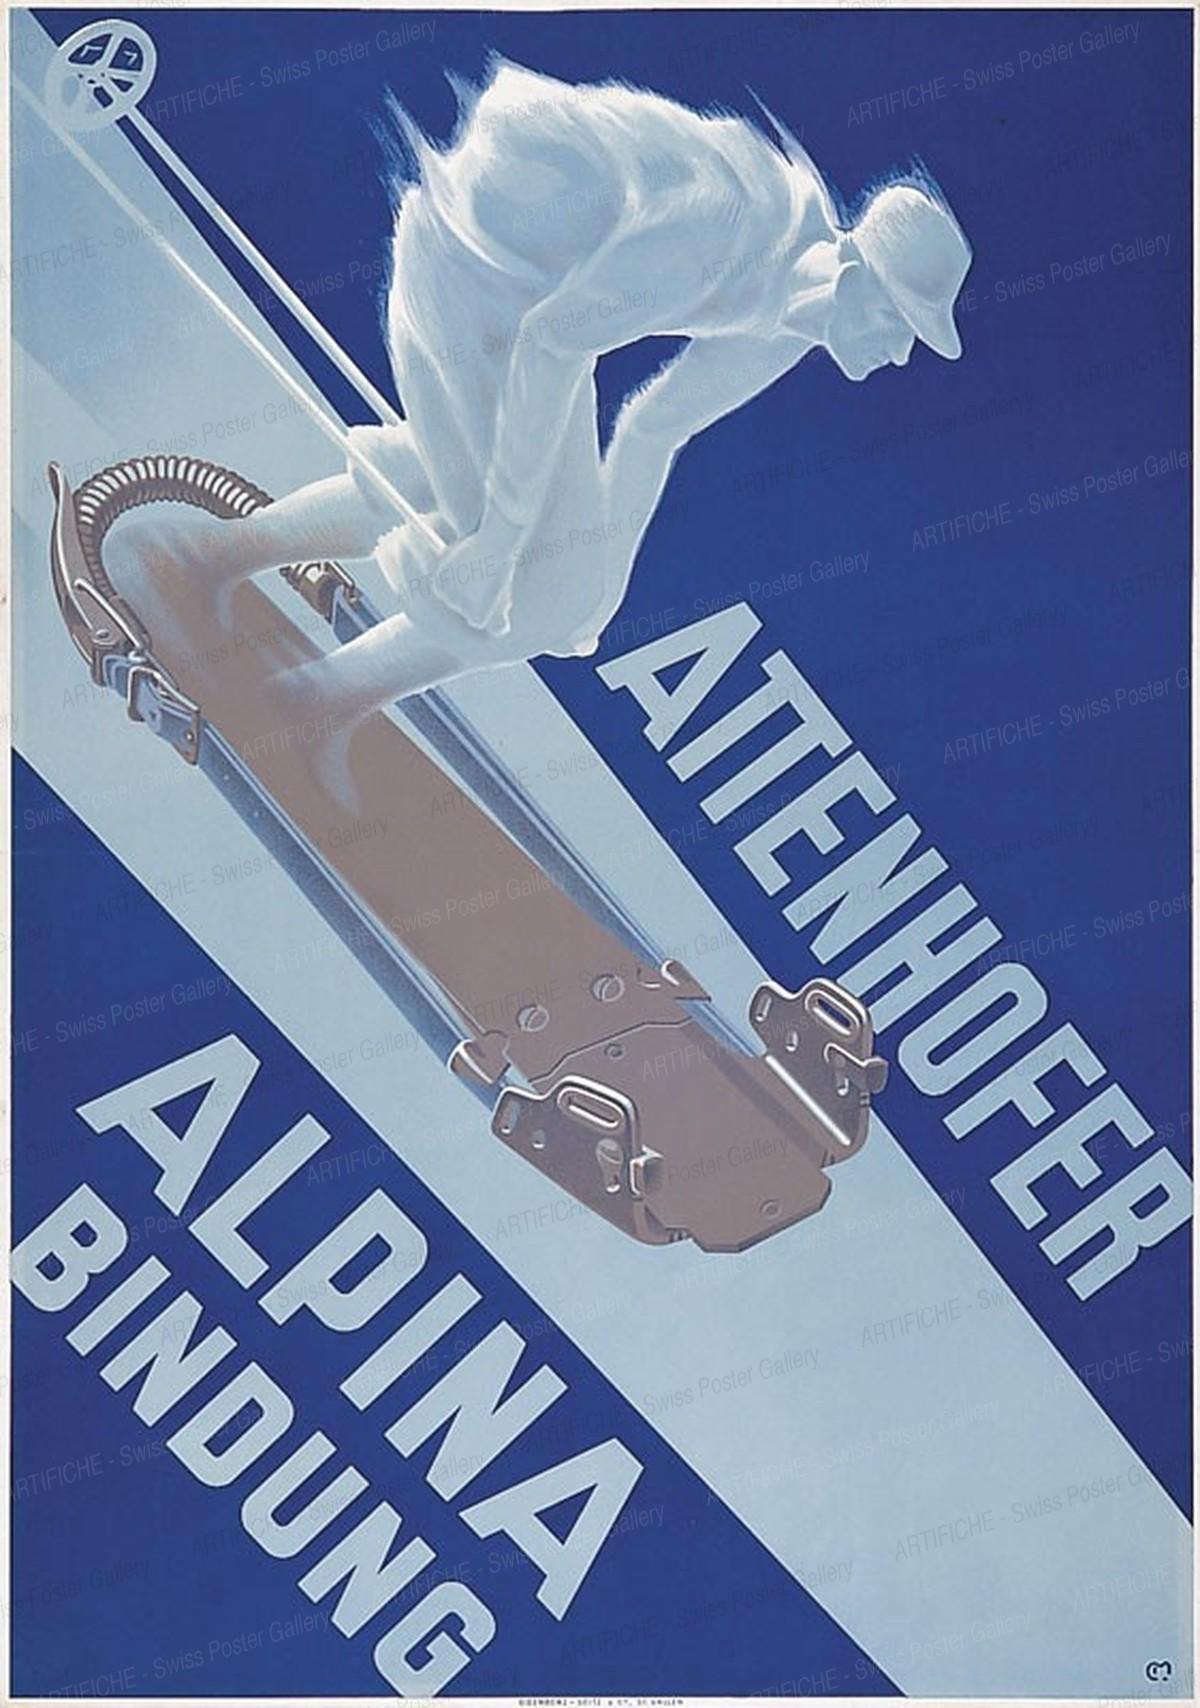 ATTENHOFER – ALPINA-BINDUNG, Carl Franz Moos